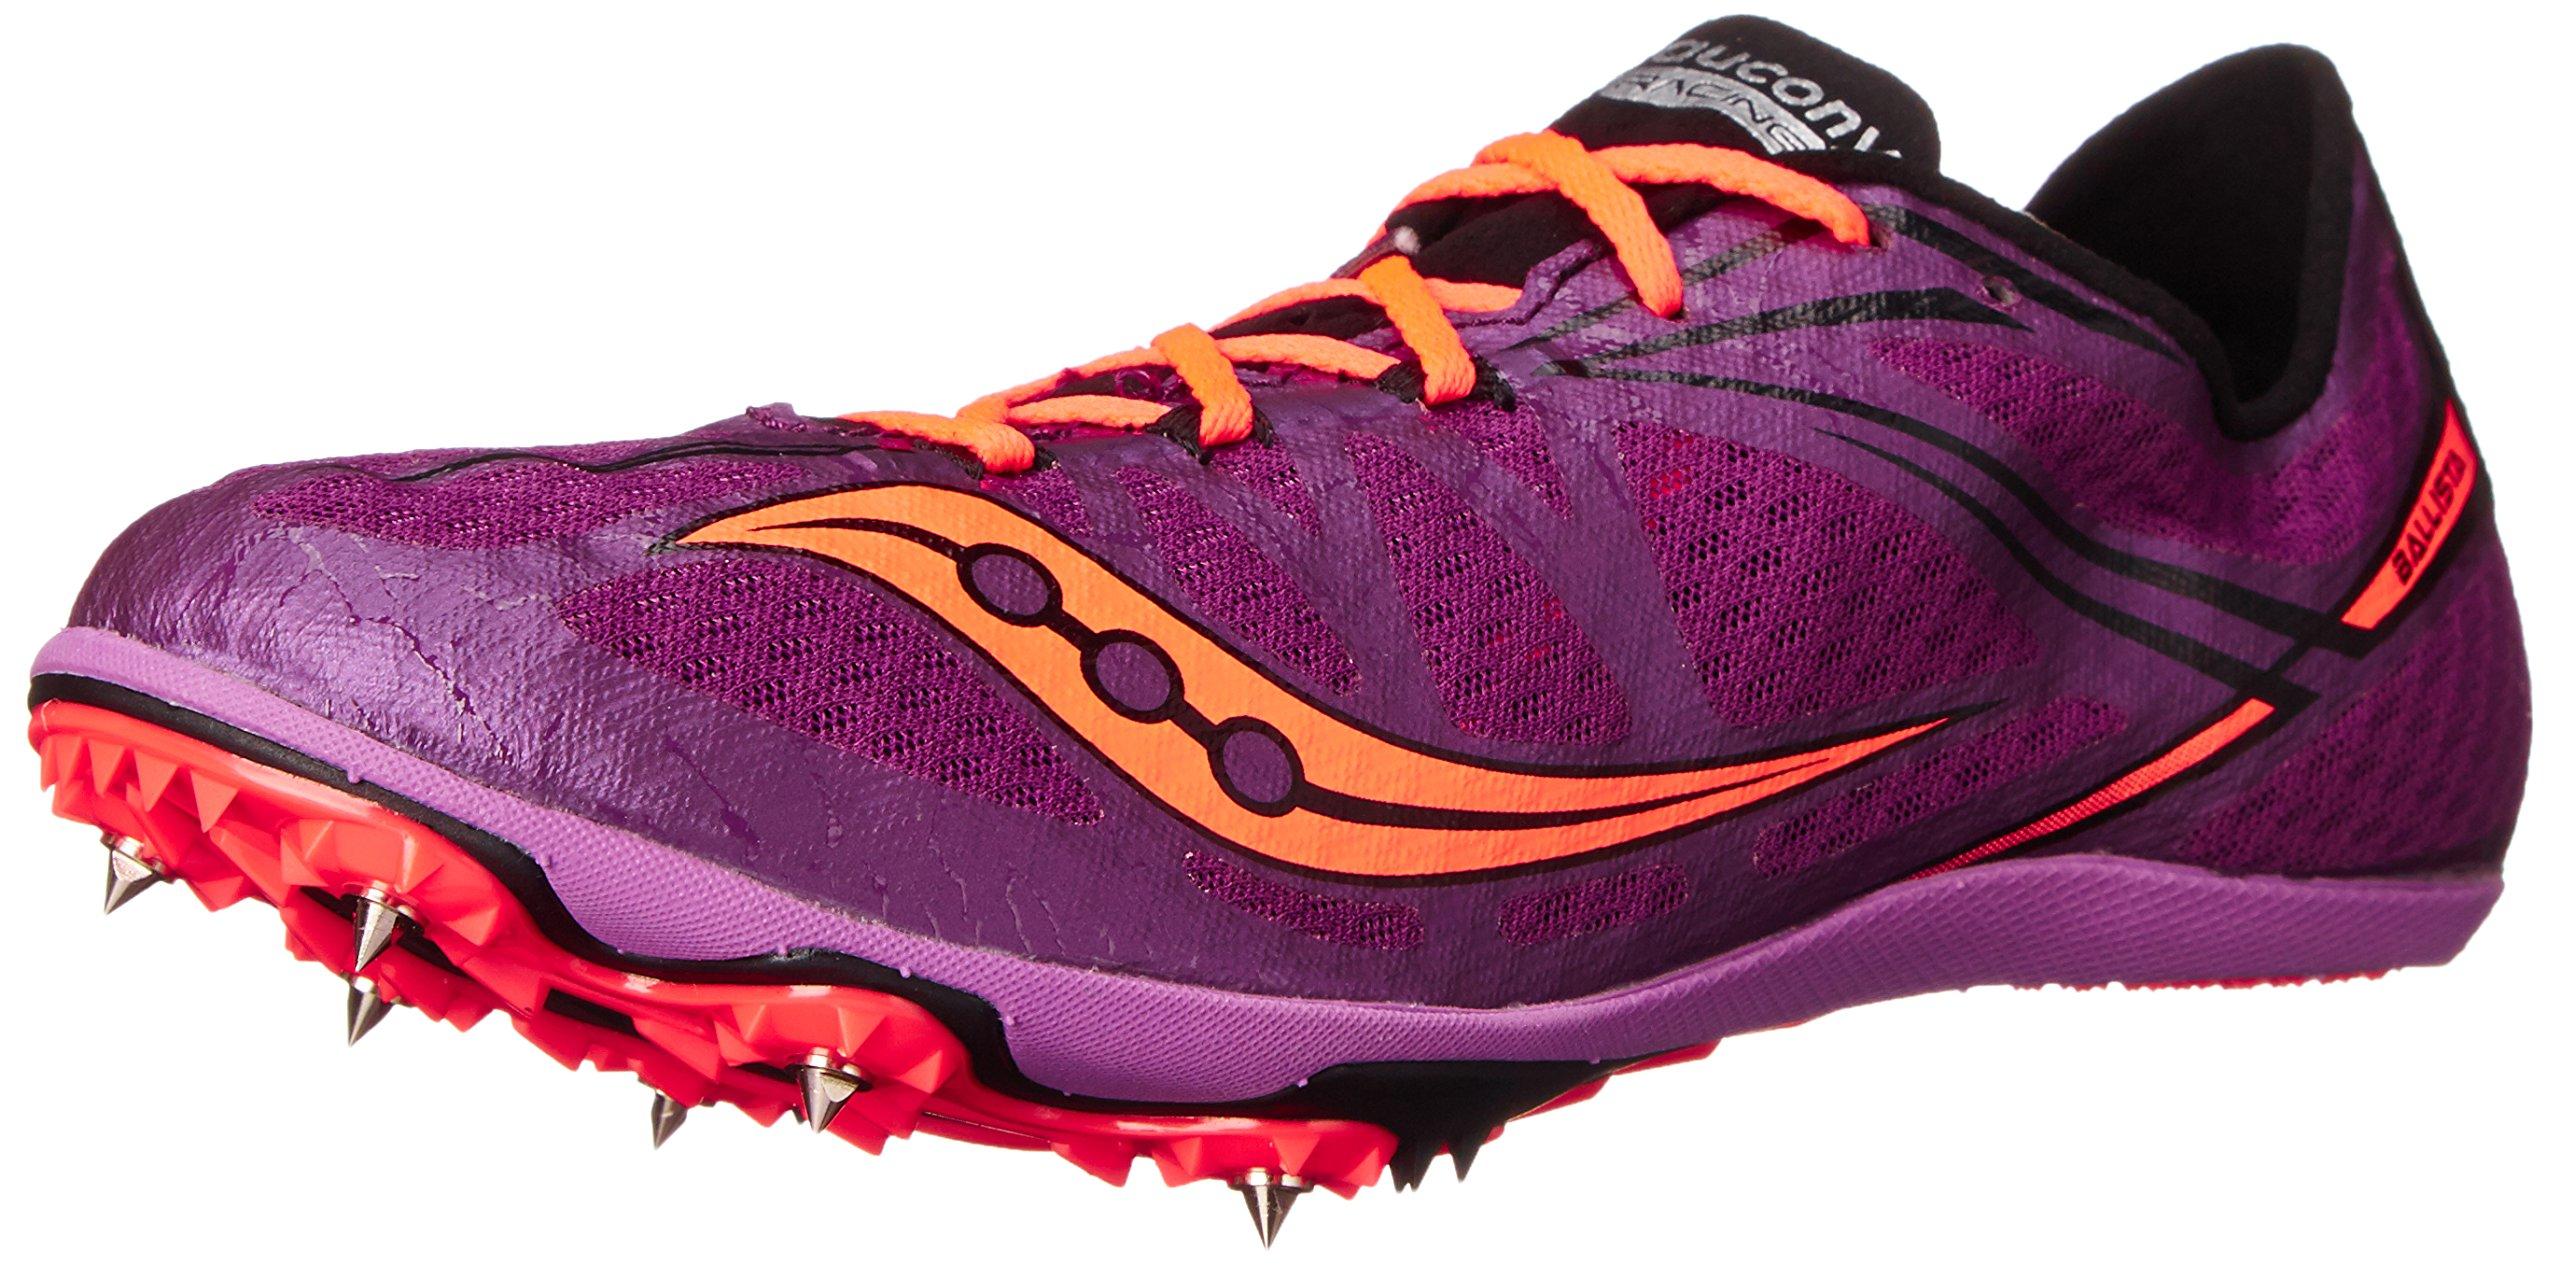 Saucony Women's Ballista Spike Shoe, Purple/Vizi Coral, 7.5 M US